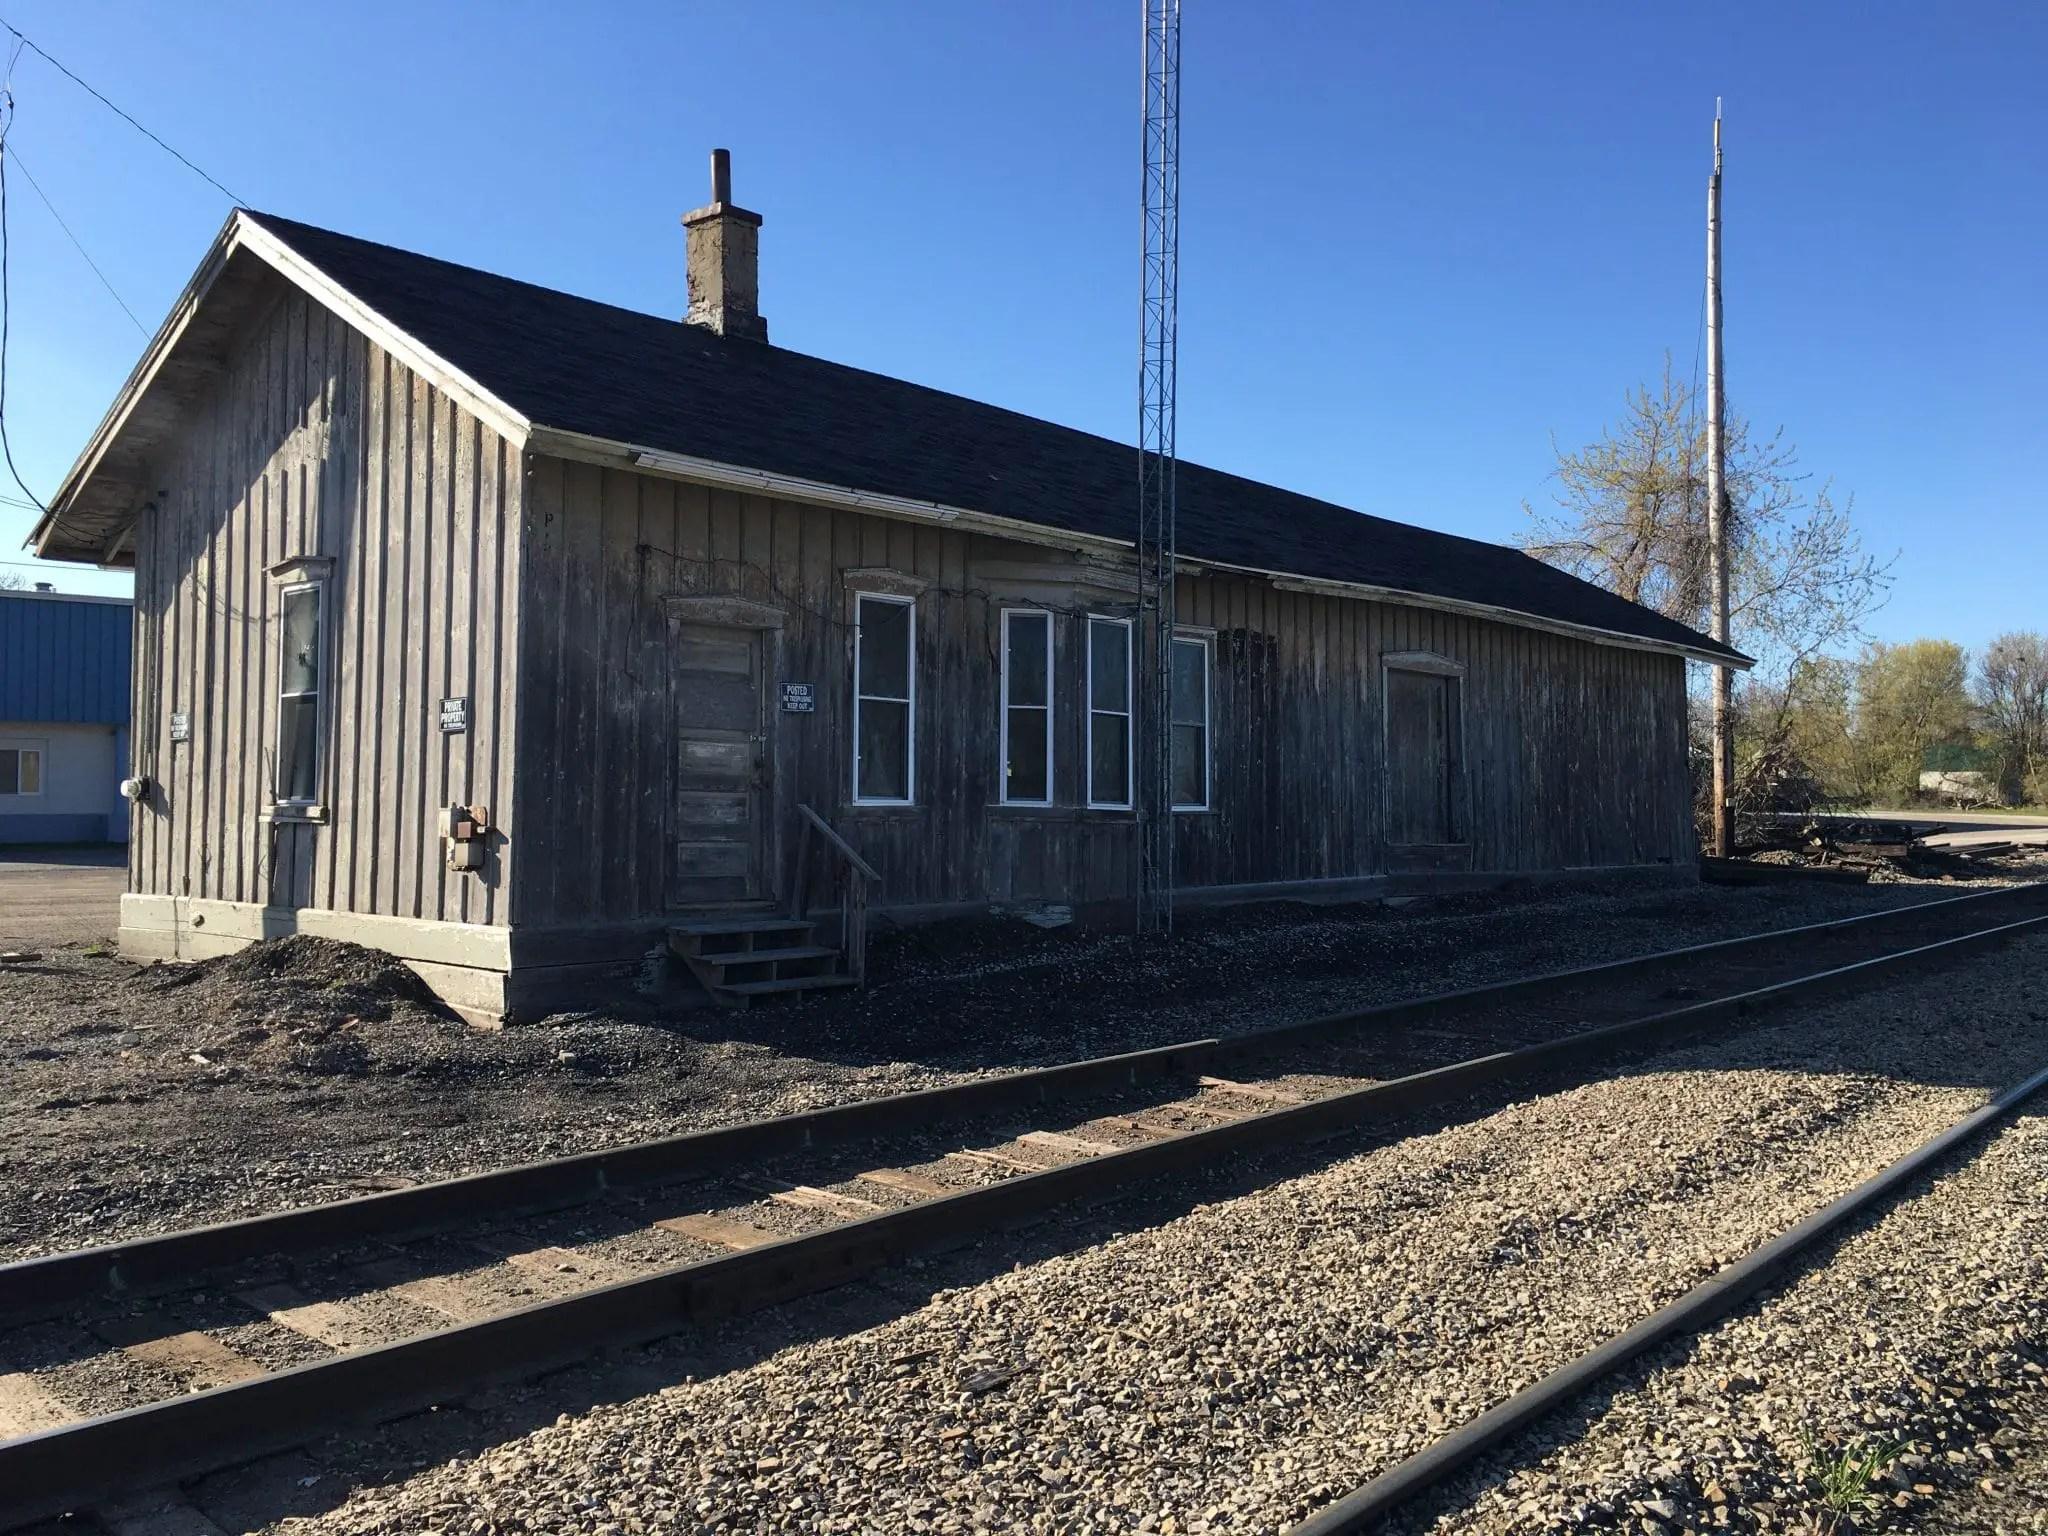 Sebewaing Railway Depot